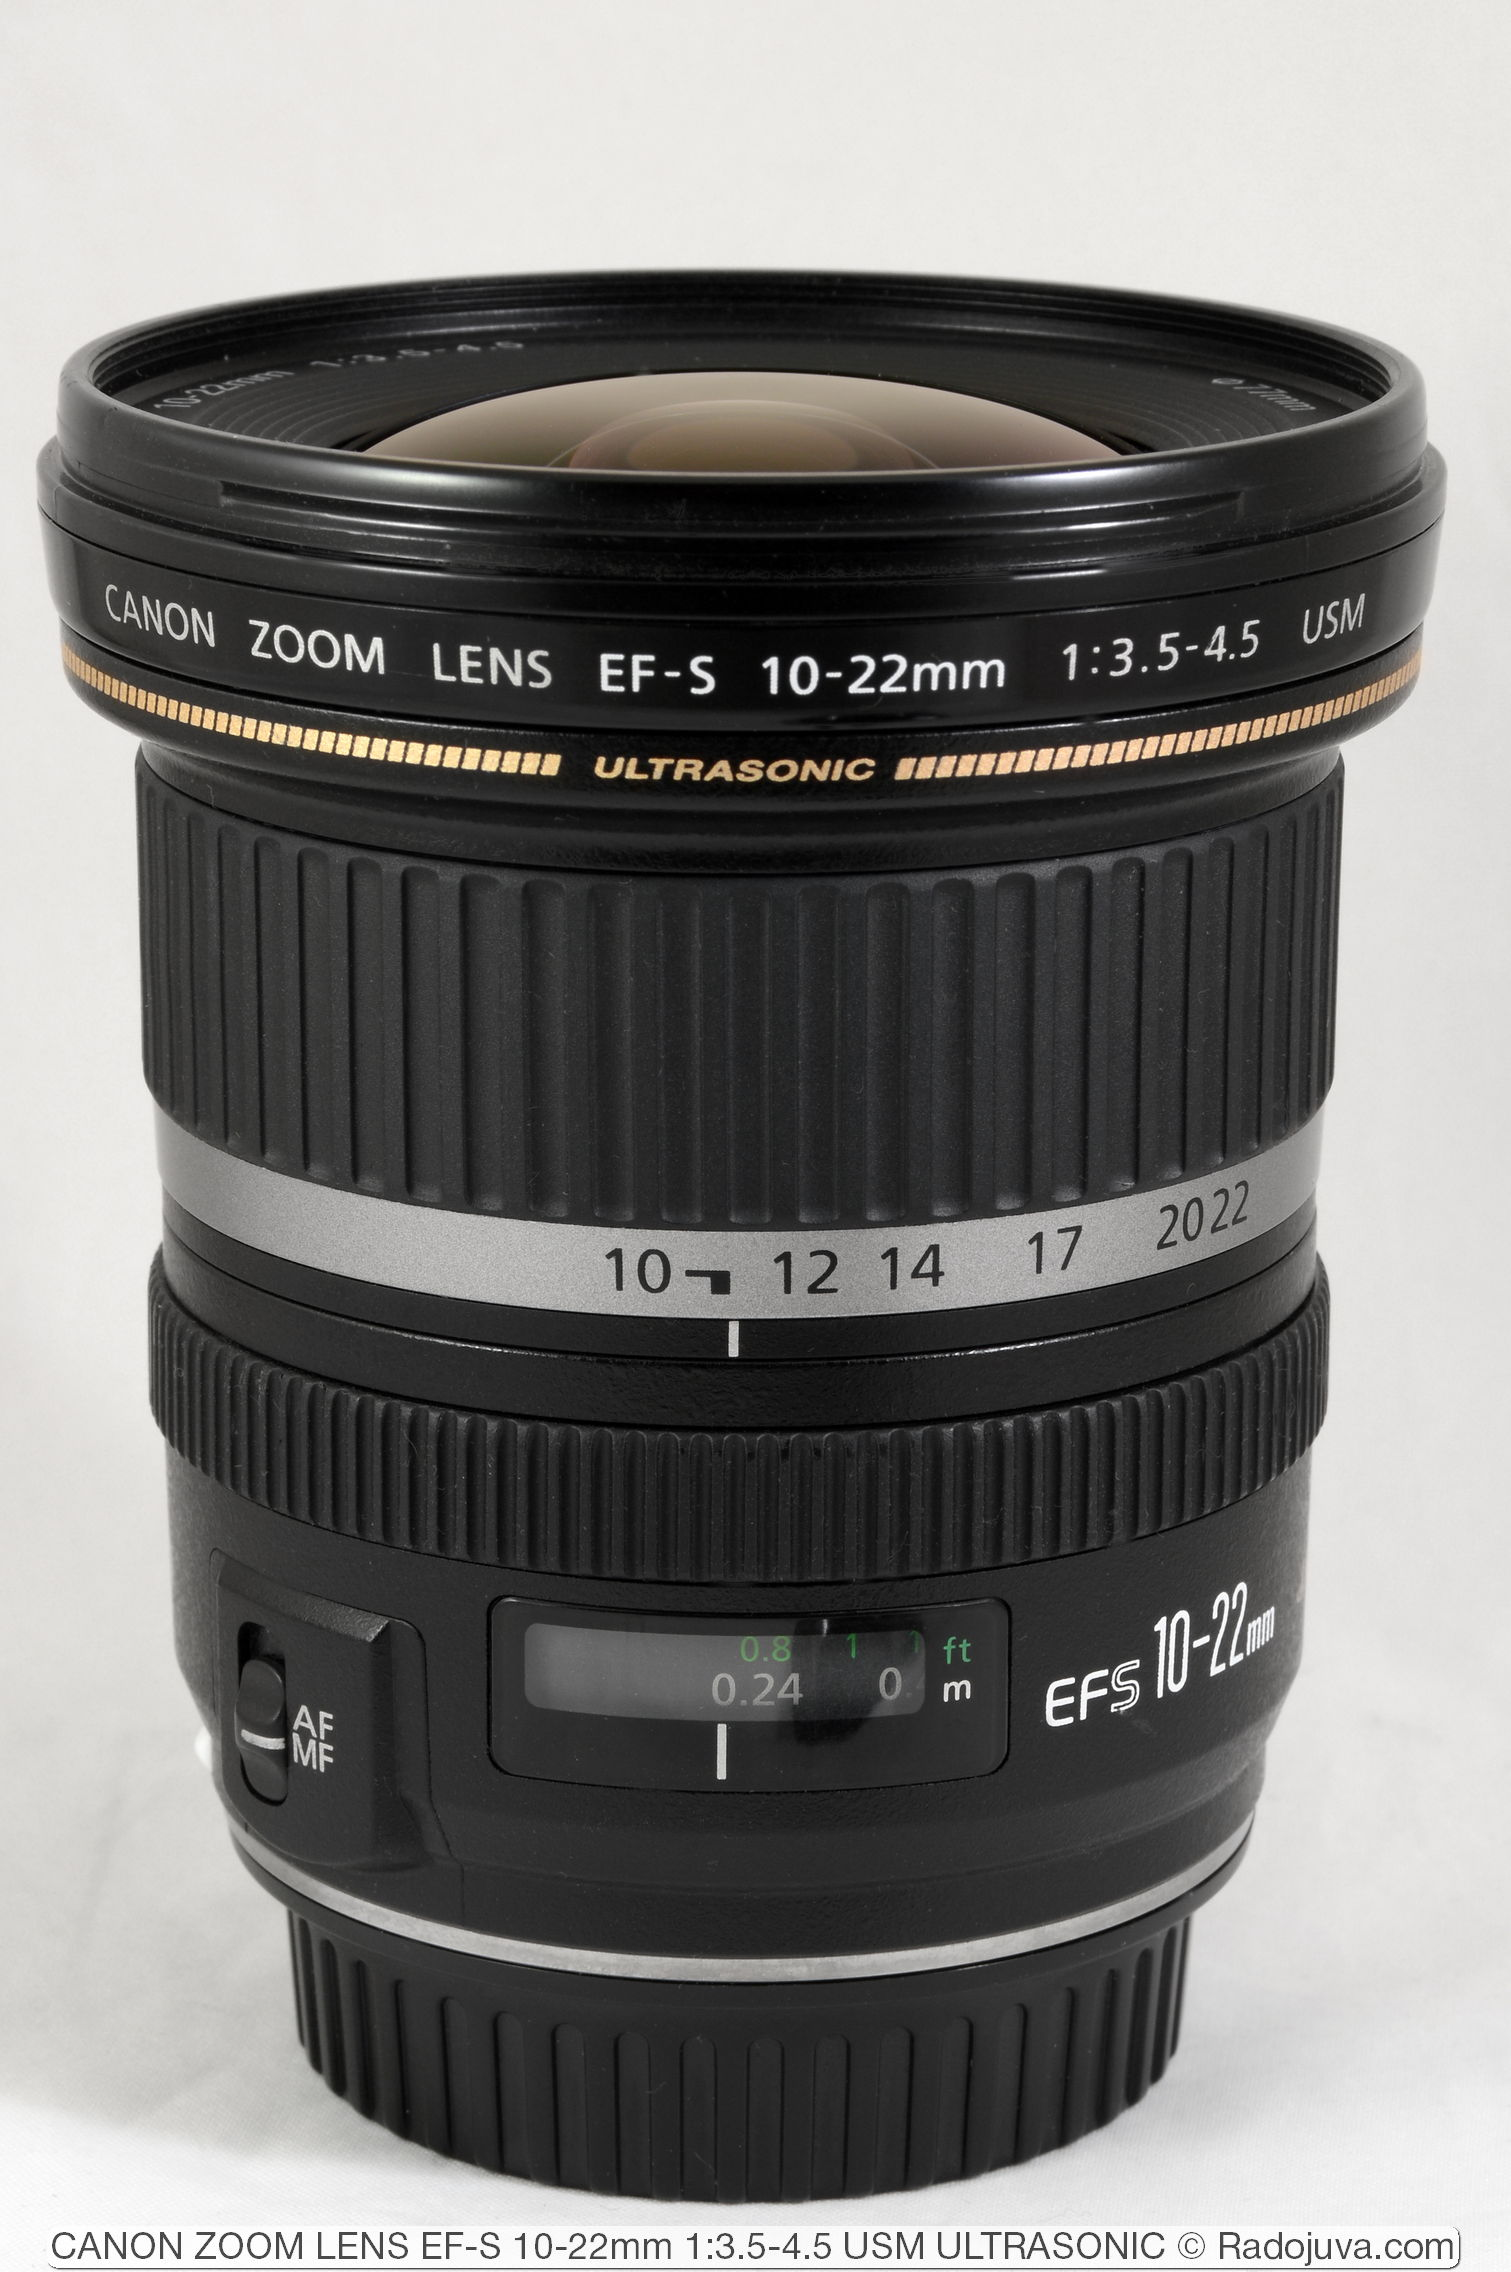 Canon Zoom Lens EF-S 10-22mm 1:3.5-4.5 USM ULTRASONIC